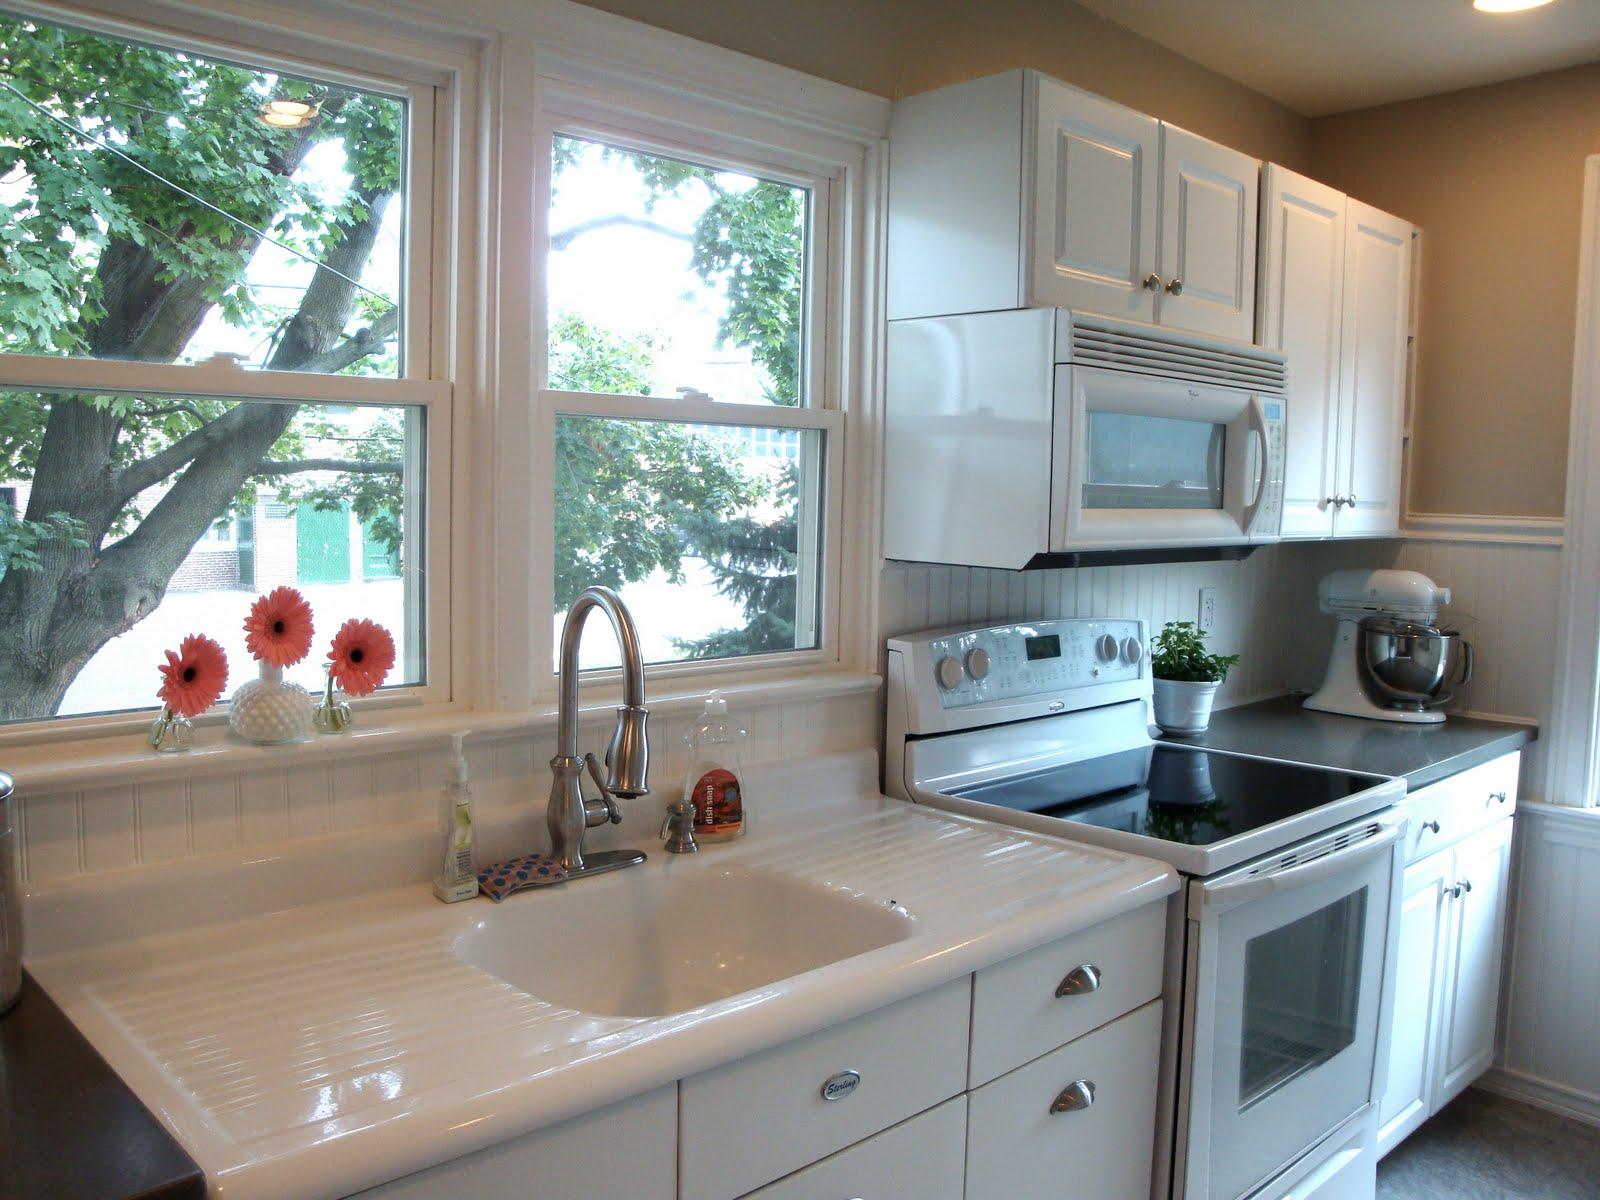 Remodelaholic | Kitchen Backsplash Tiles, Now Beadboard